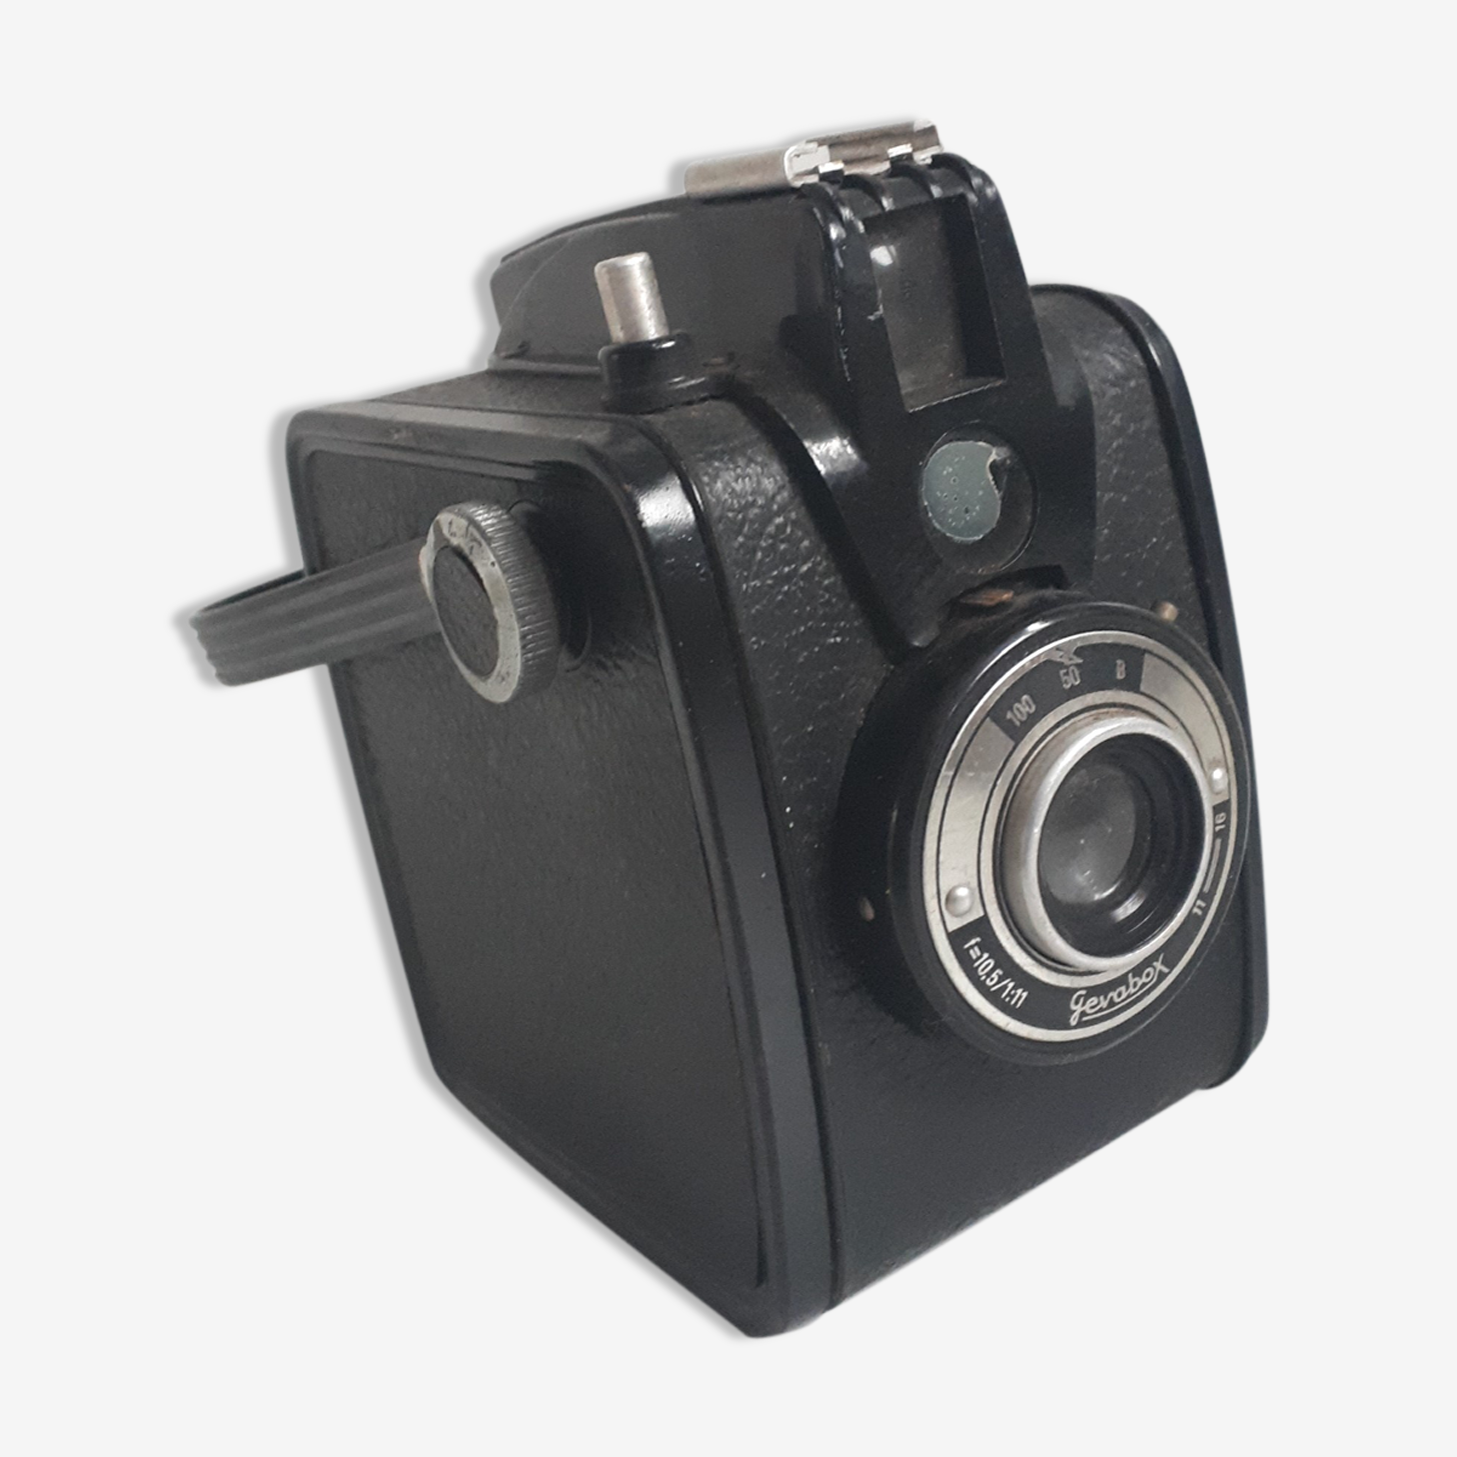 Camera Gevabox 1955